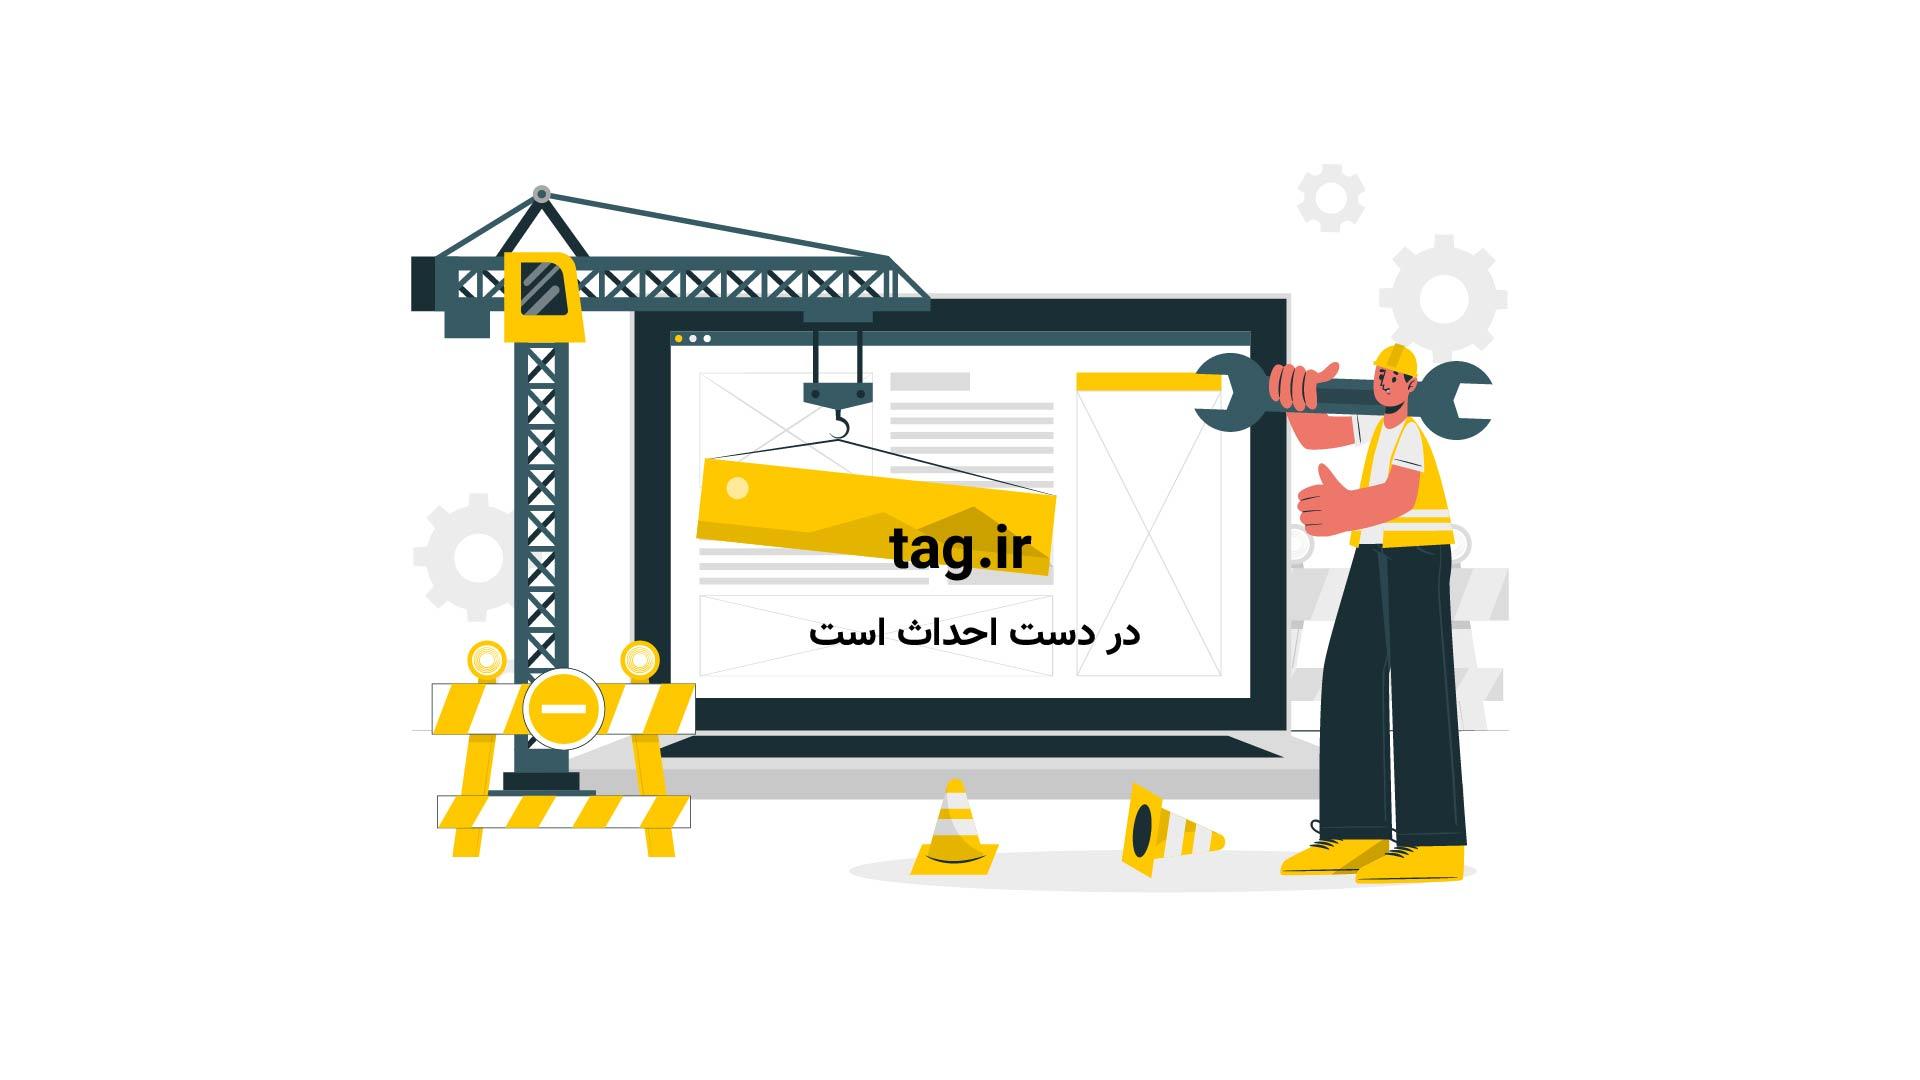 نقاشی صورت به سبک آبرنگ | فیلم